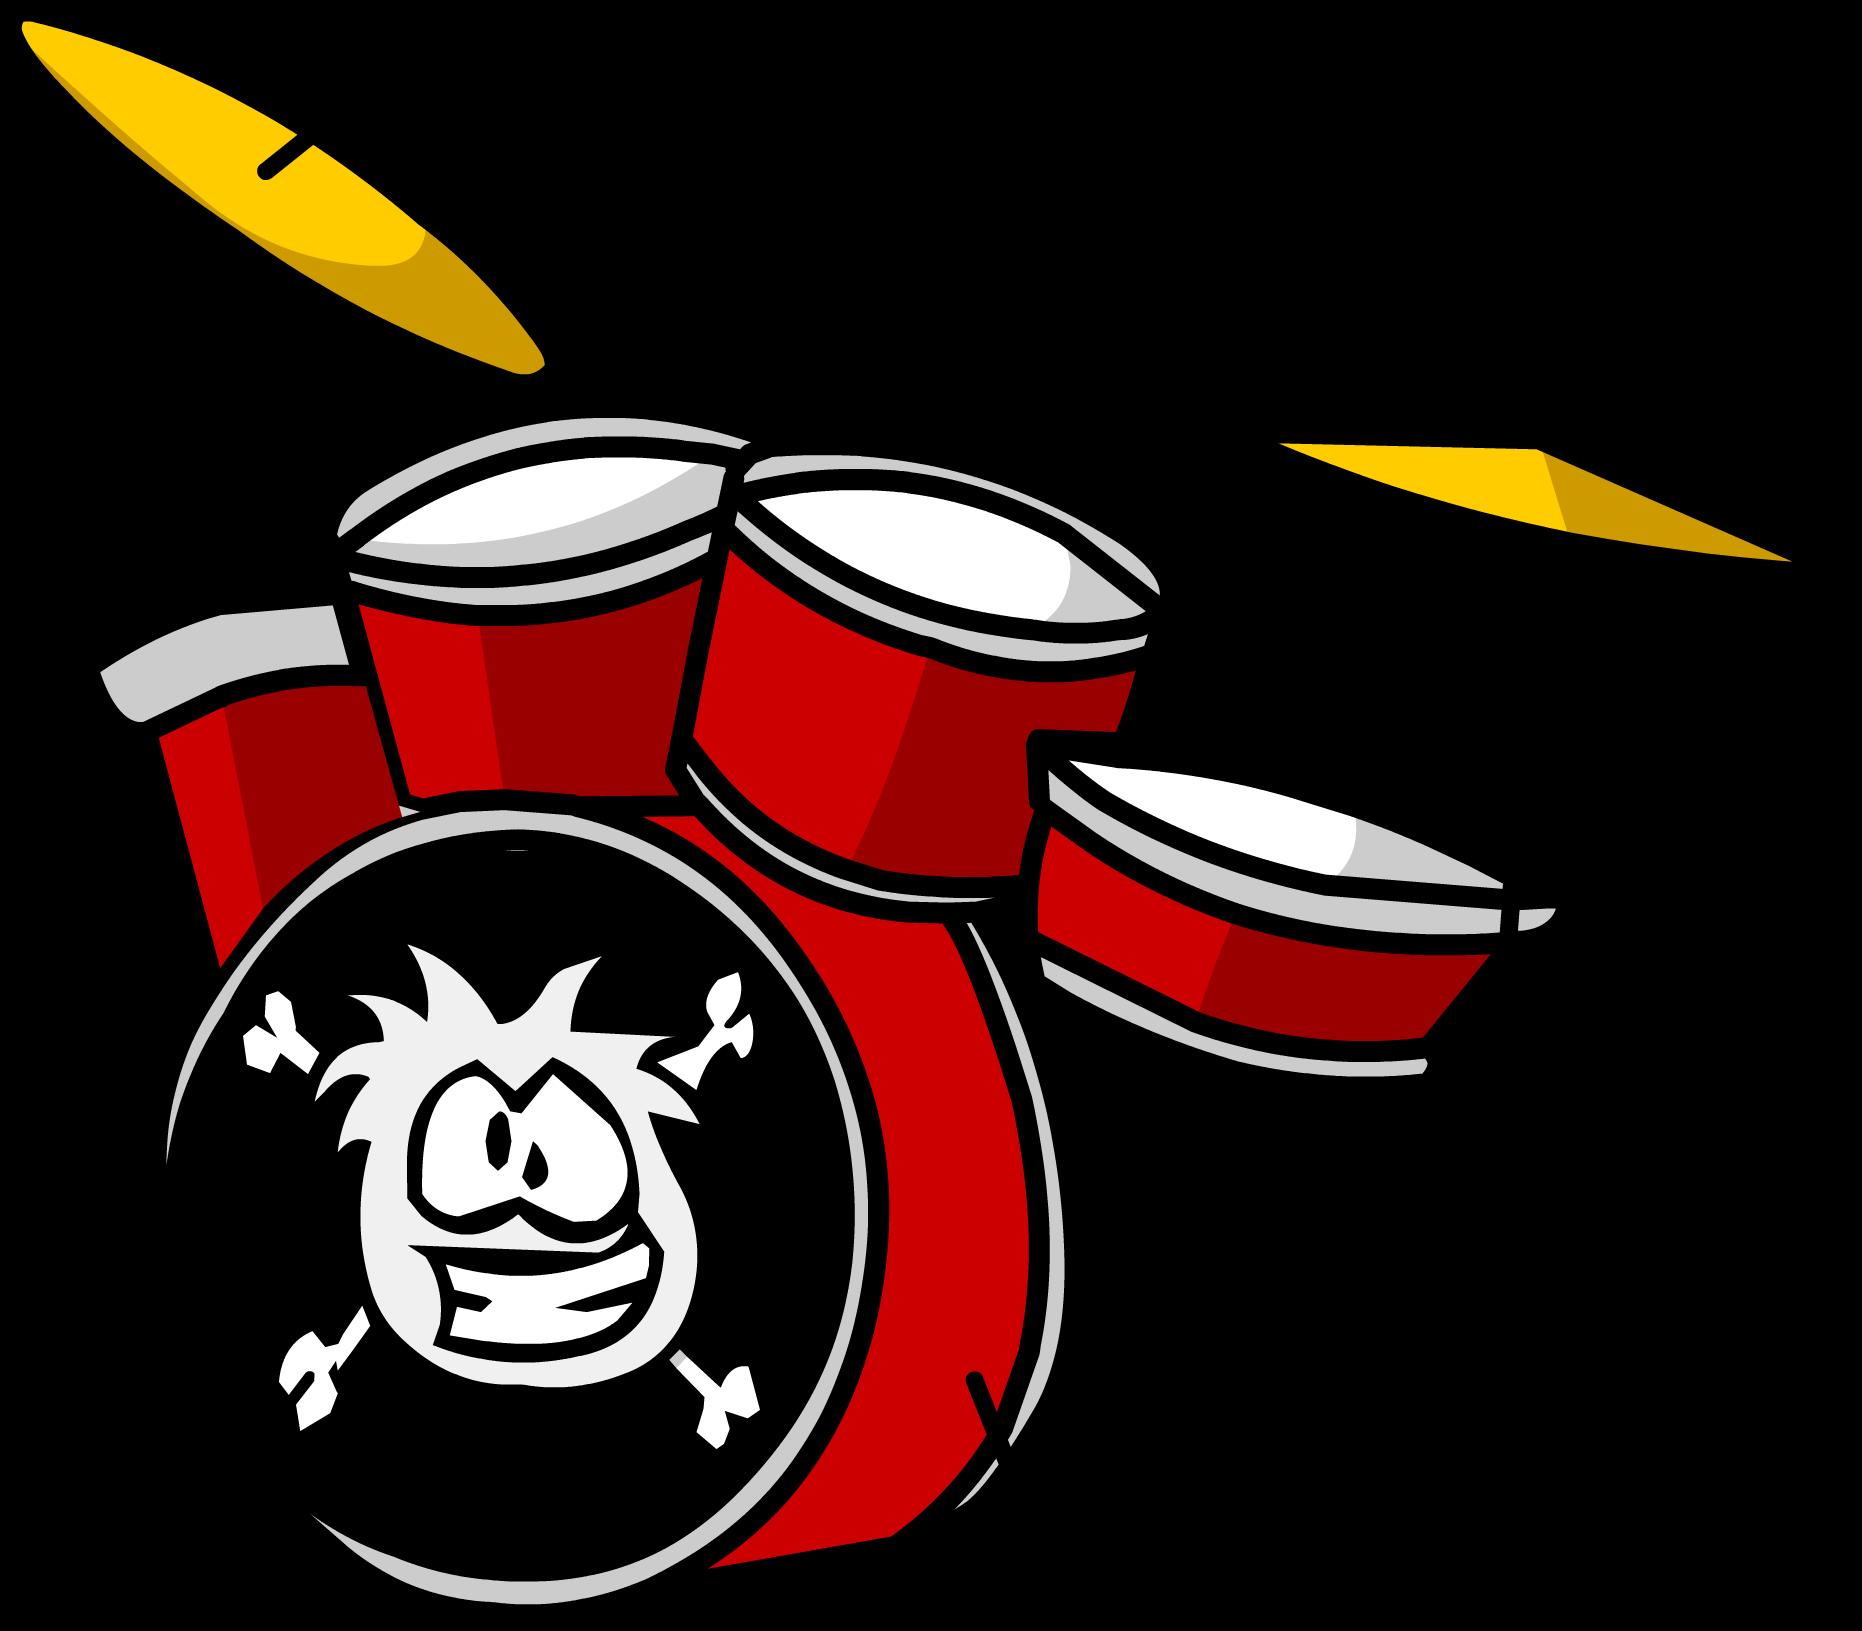 Image kit sprite png. Red clipart drum set